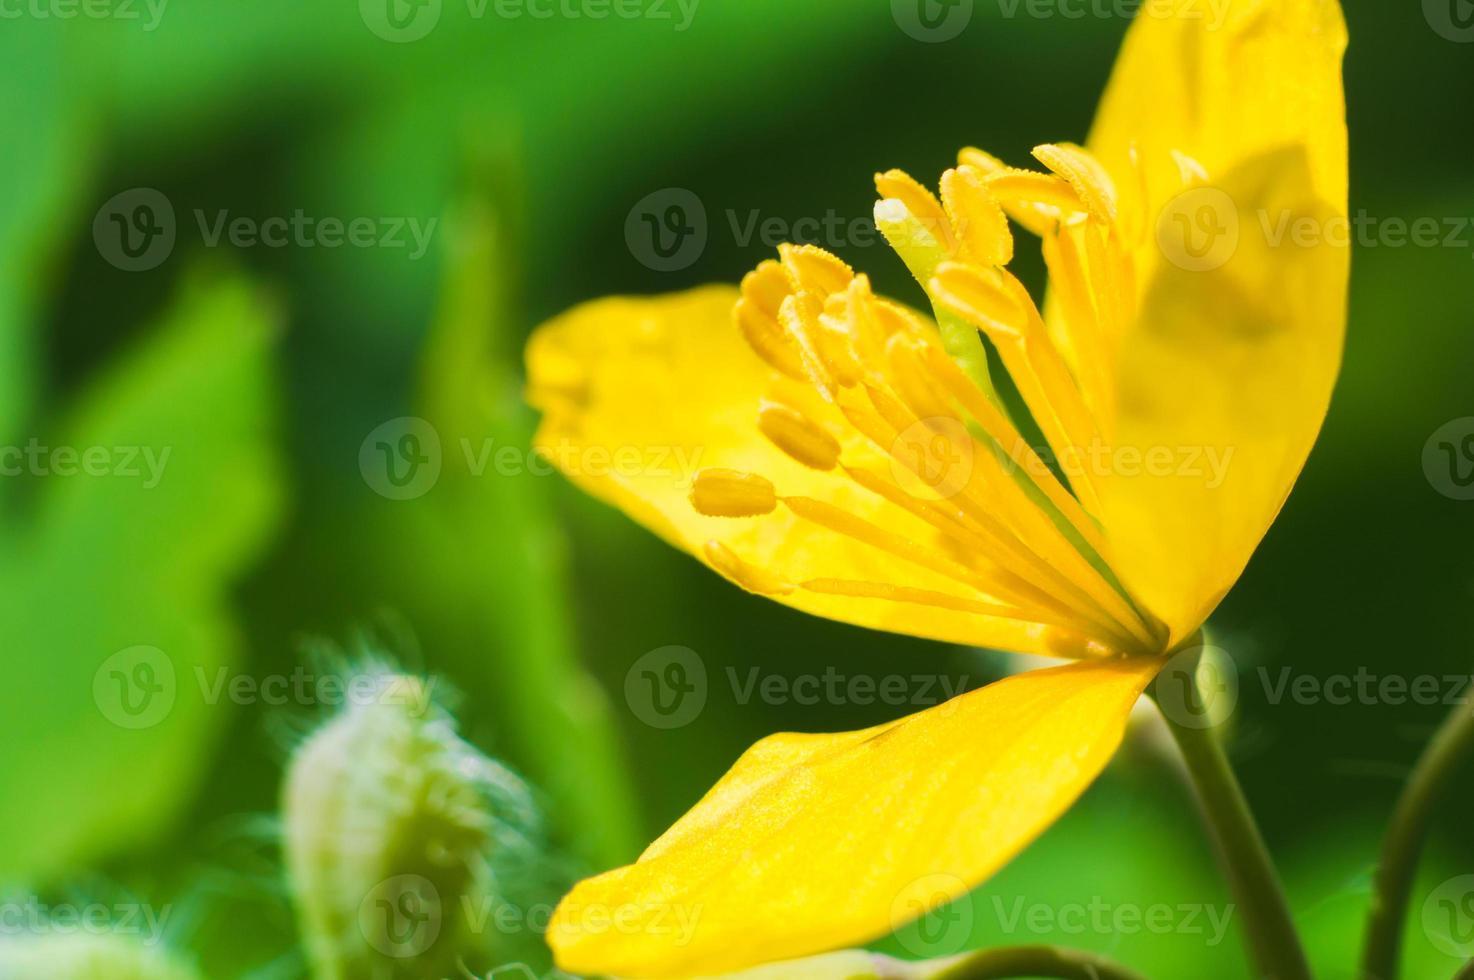 Anémone jaune en macro sur fond flou vert photo